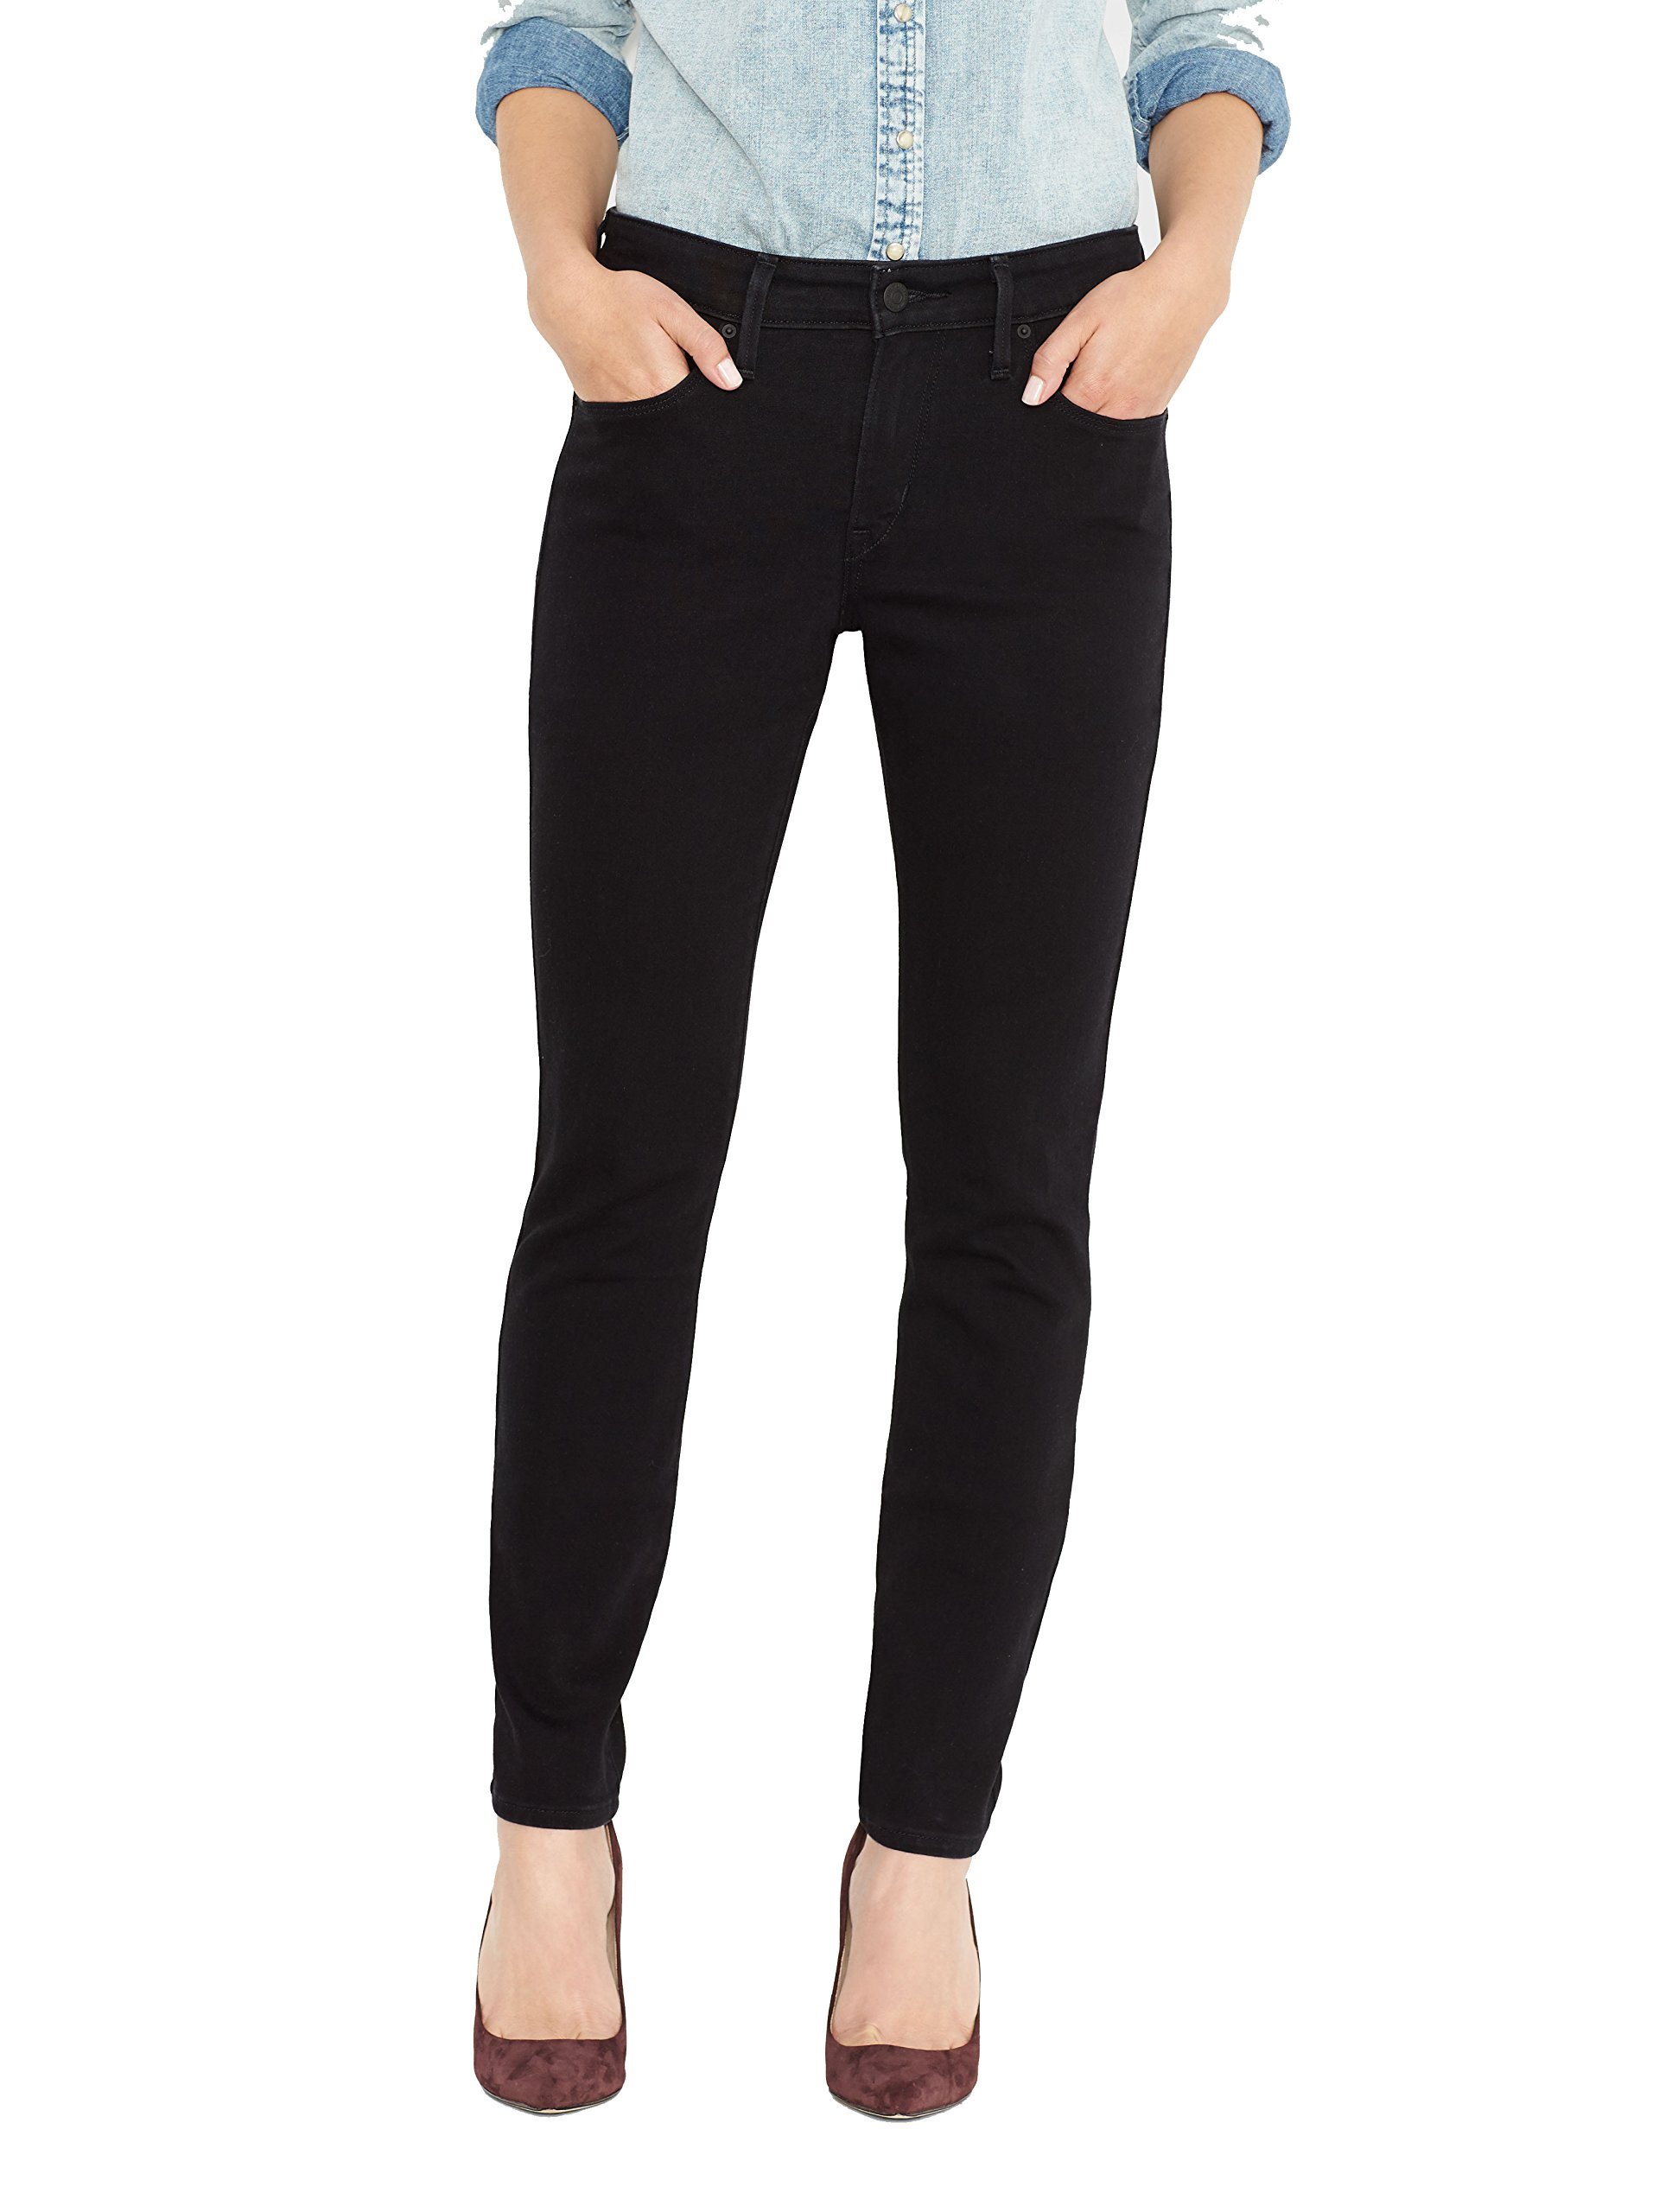 Levi's Women's Mid Rise Skinny Jean, Black Sateen, 29 (US 8) L